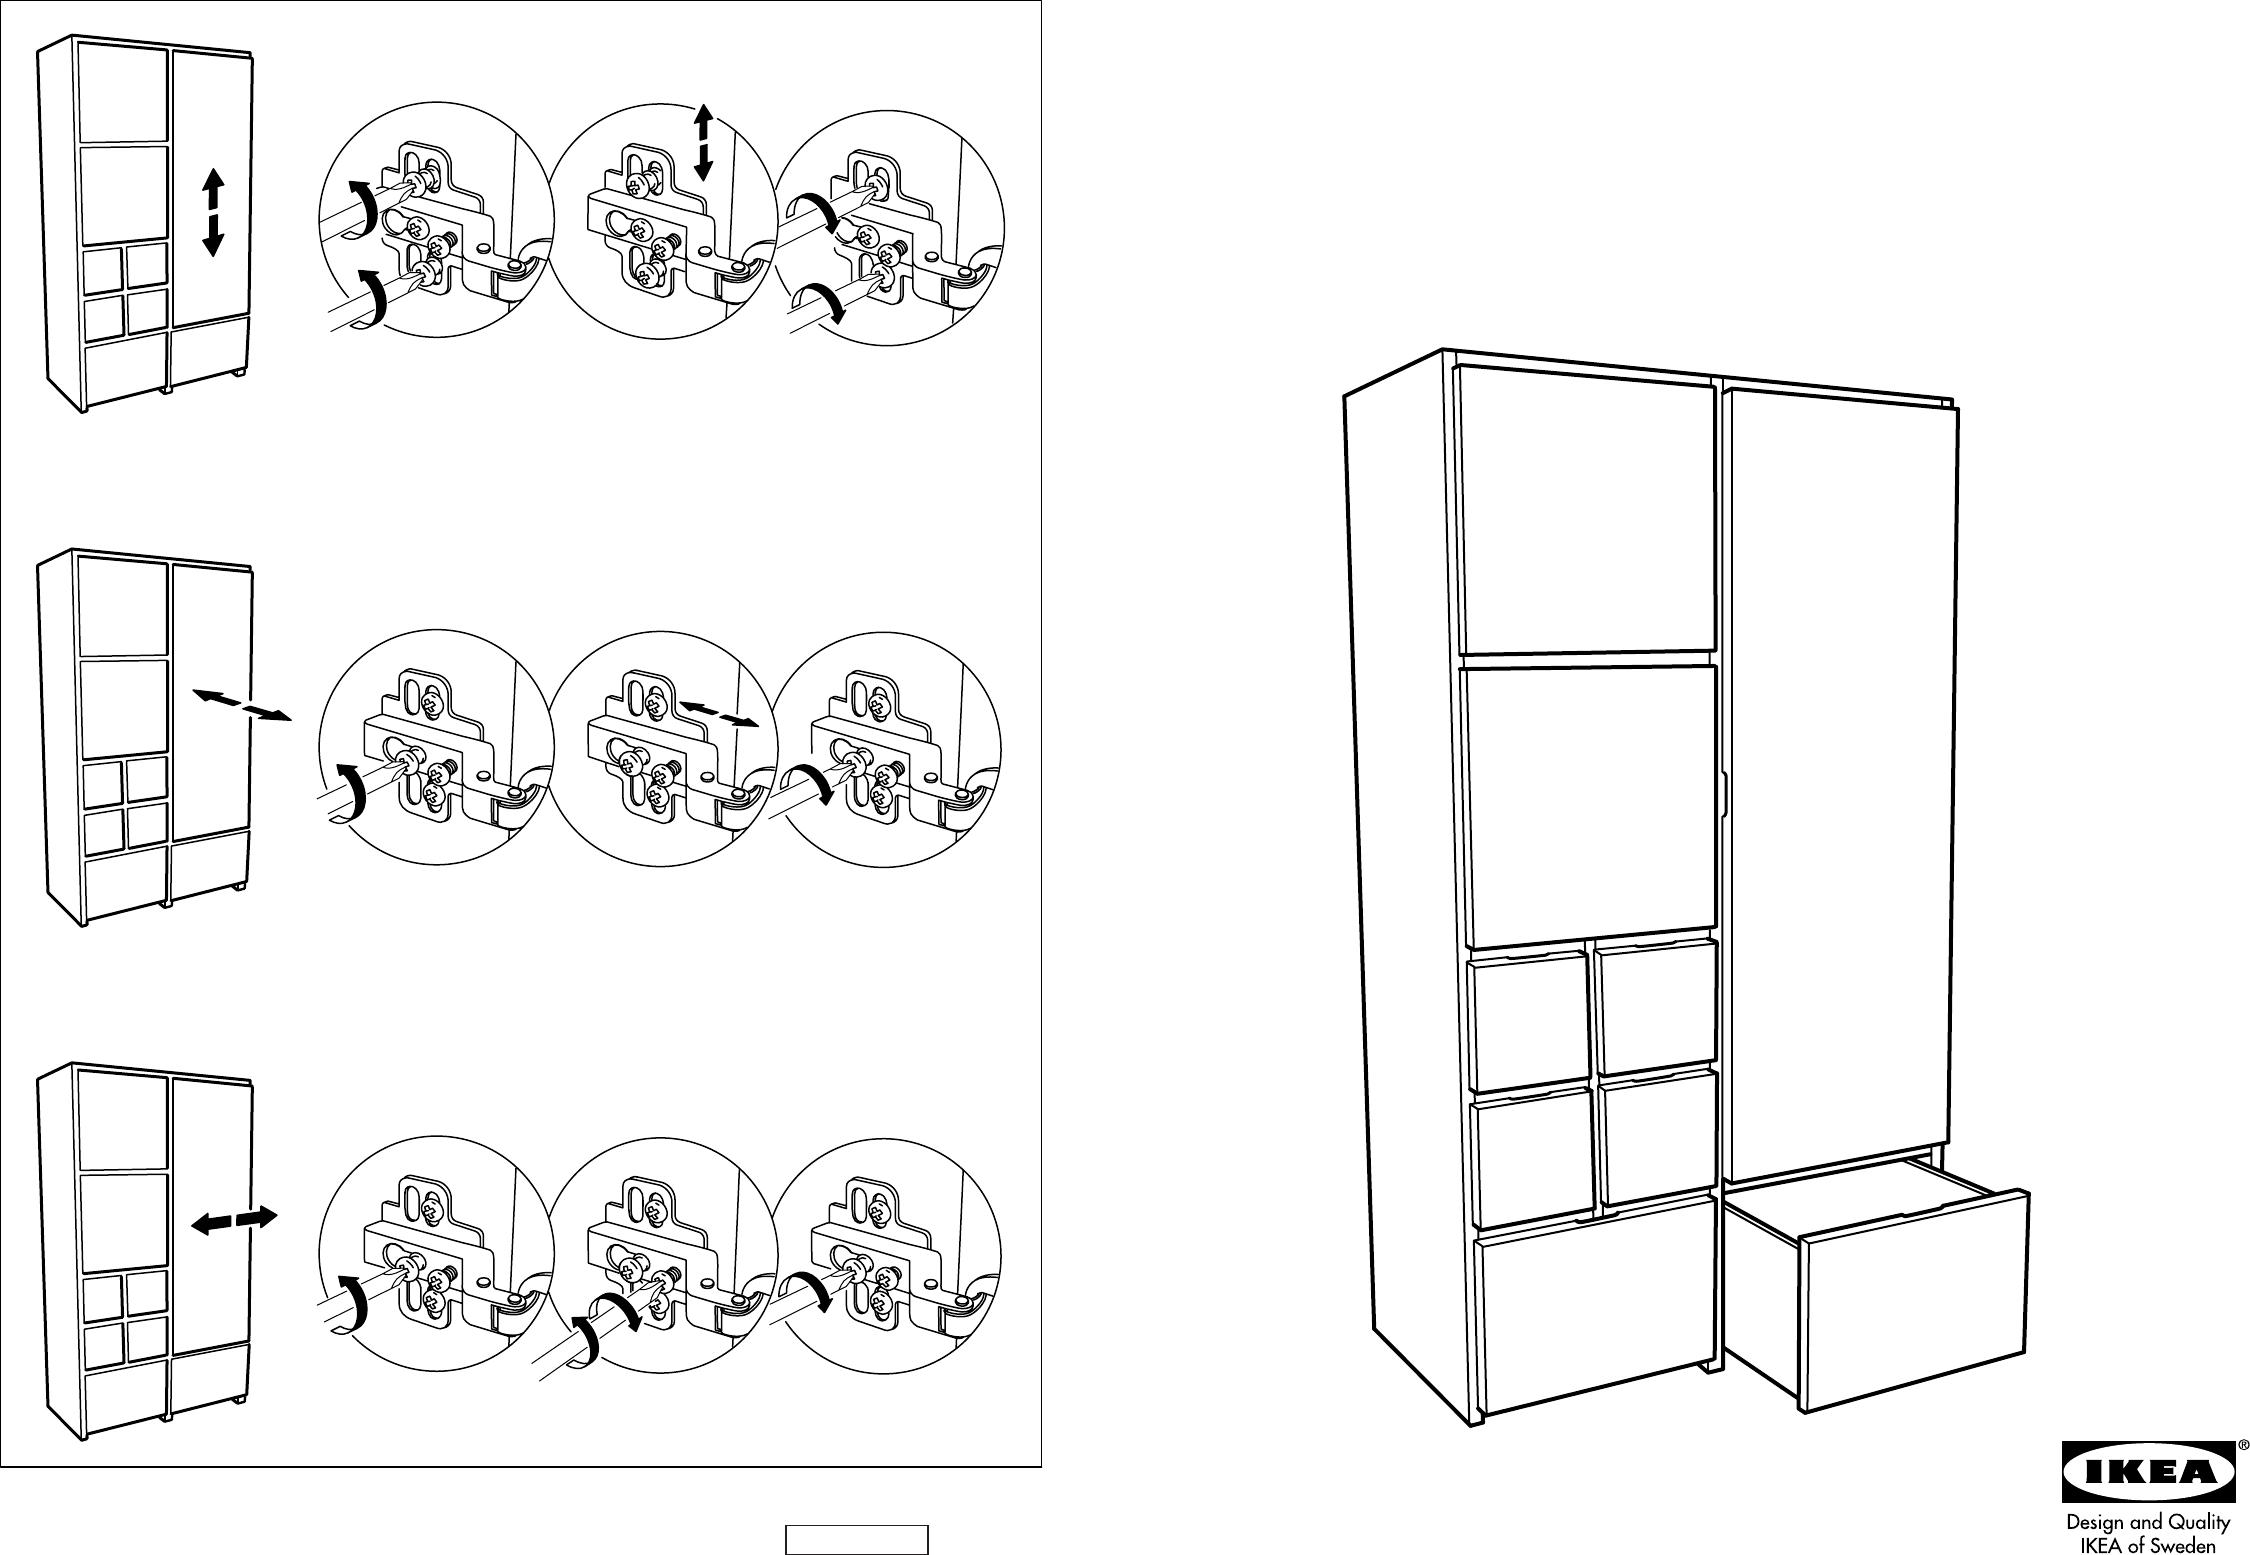 Grundtal Towel Stand From Ikea ~ Handleiding Ikea Rakke kast (pagina 1 van 12) (Dansk, Deutsch, English